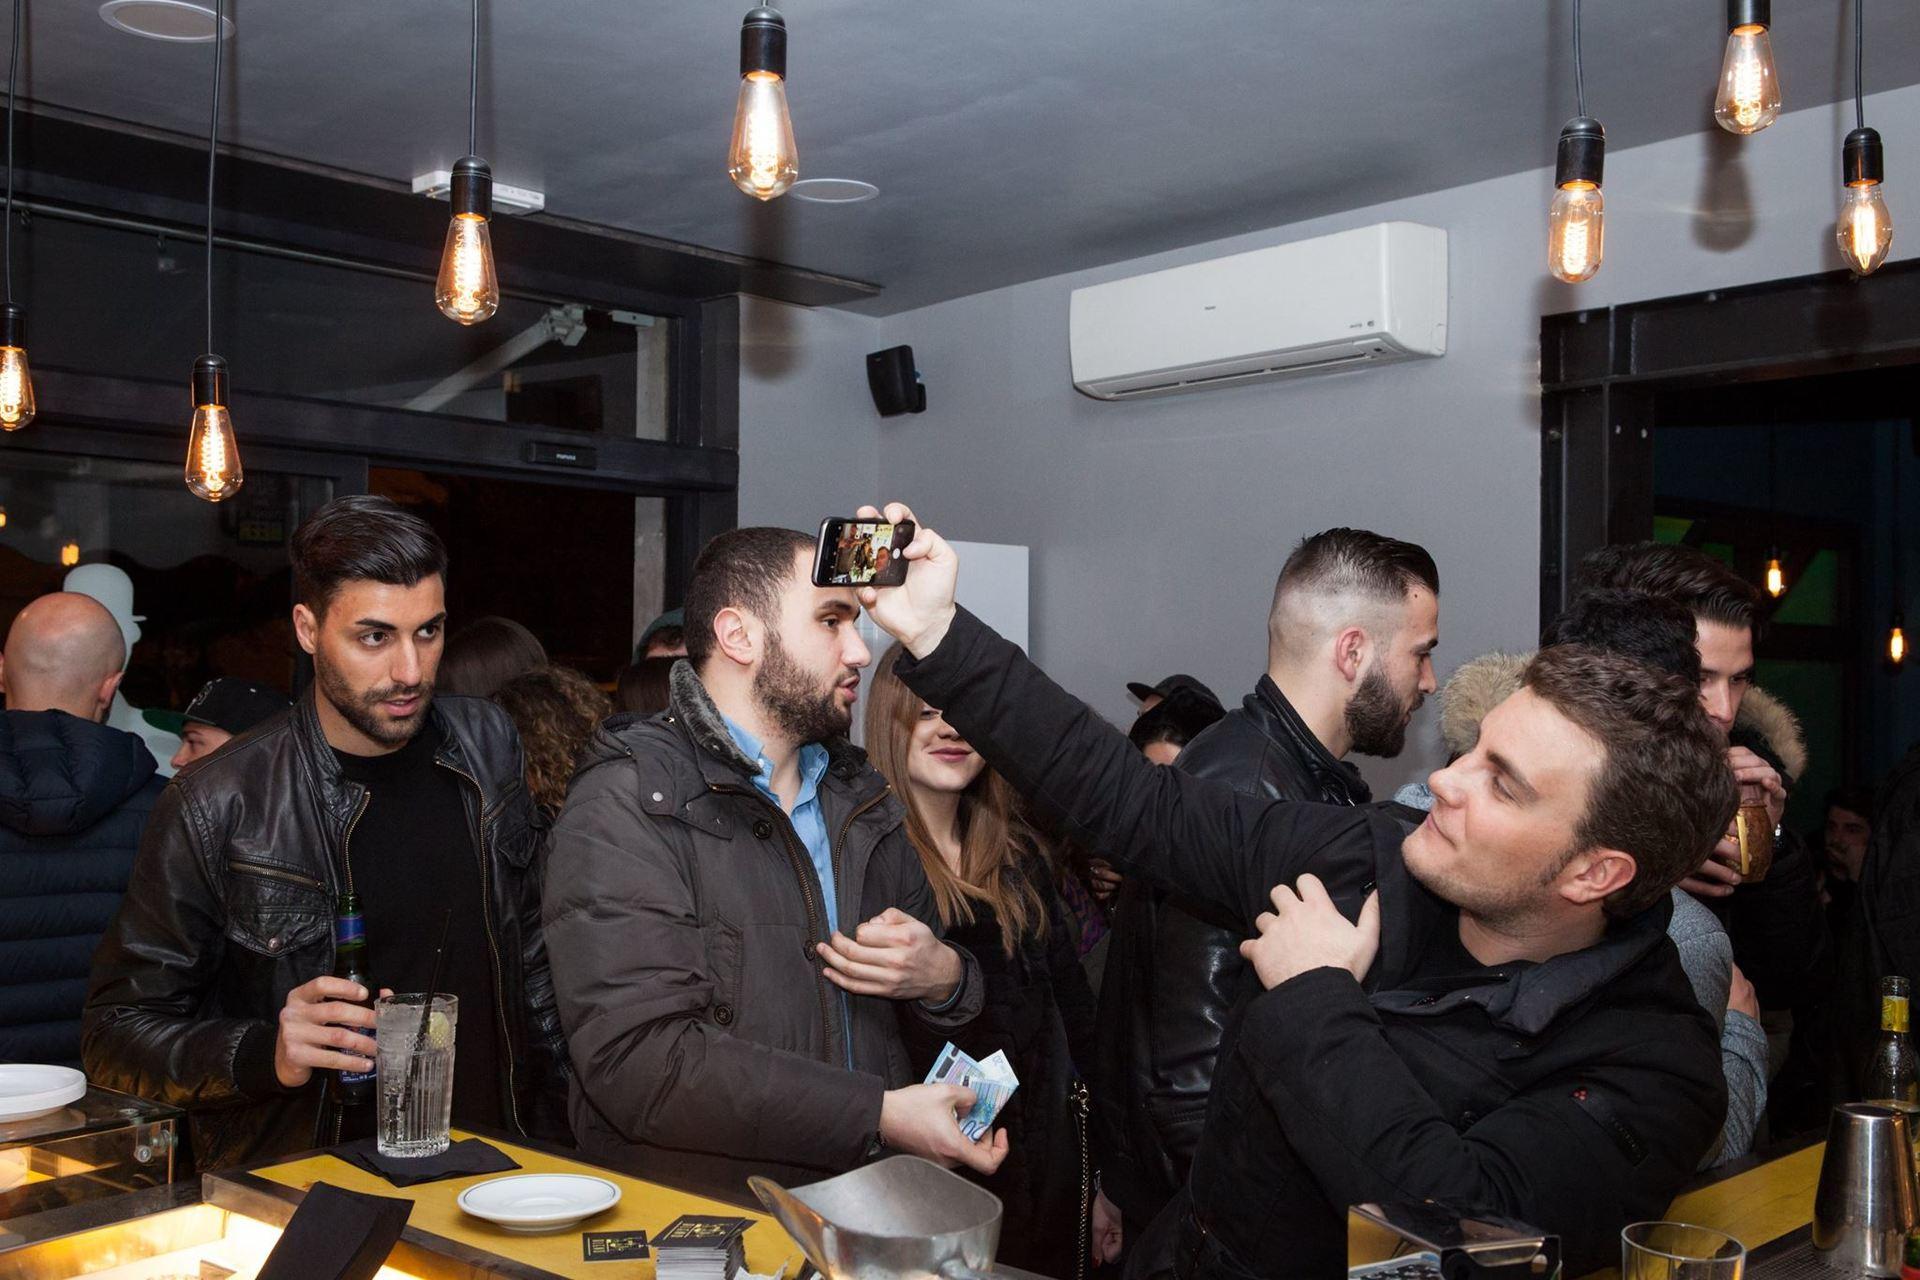 un uomo mentre clicca un selfie